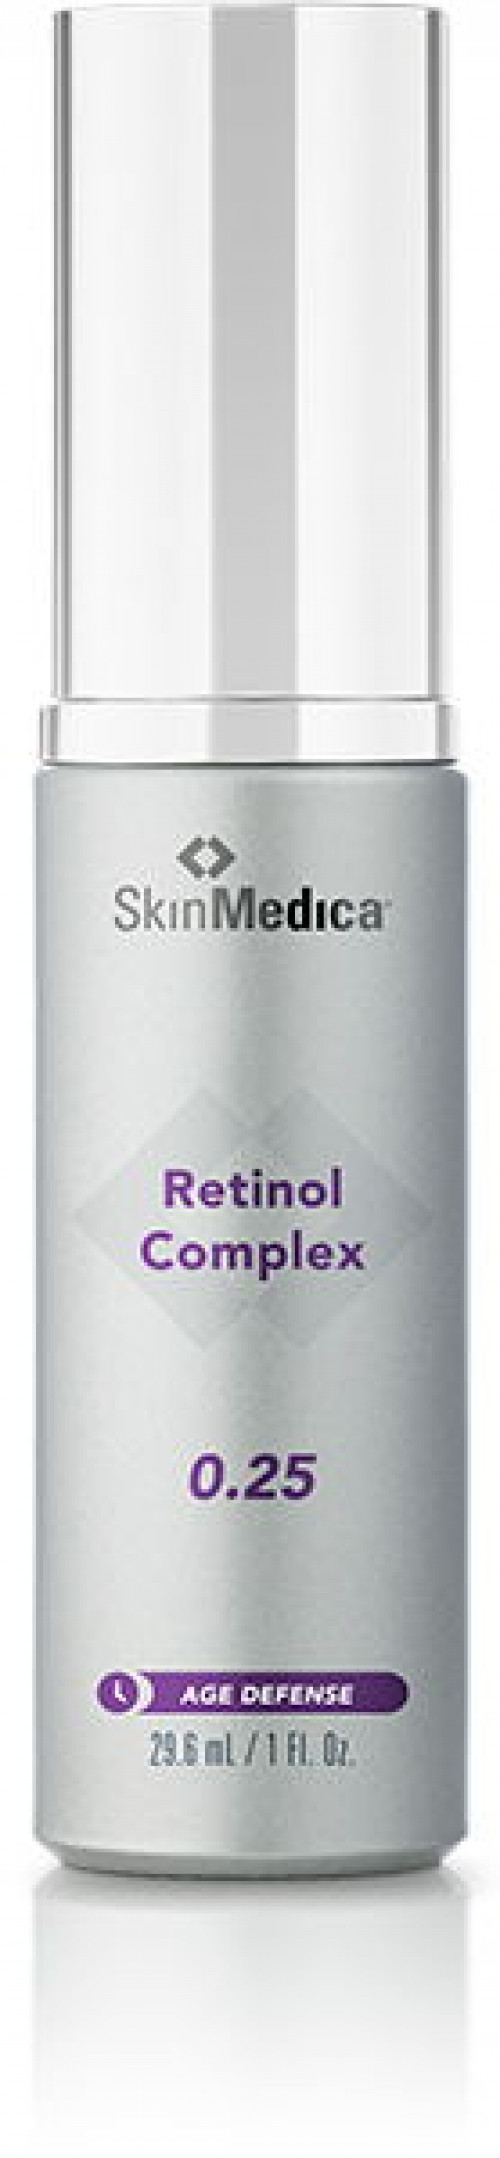 Retinol Complex 0.25 by SkinMedica